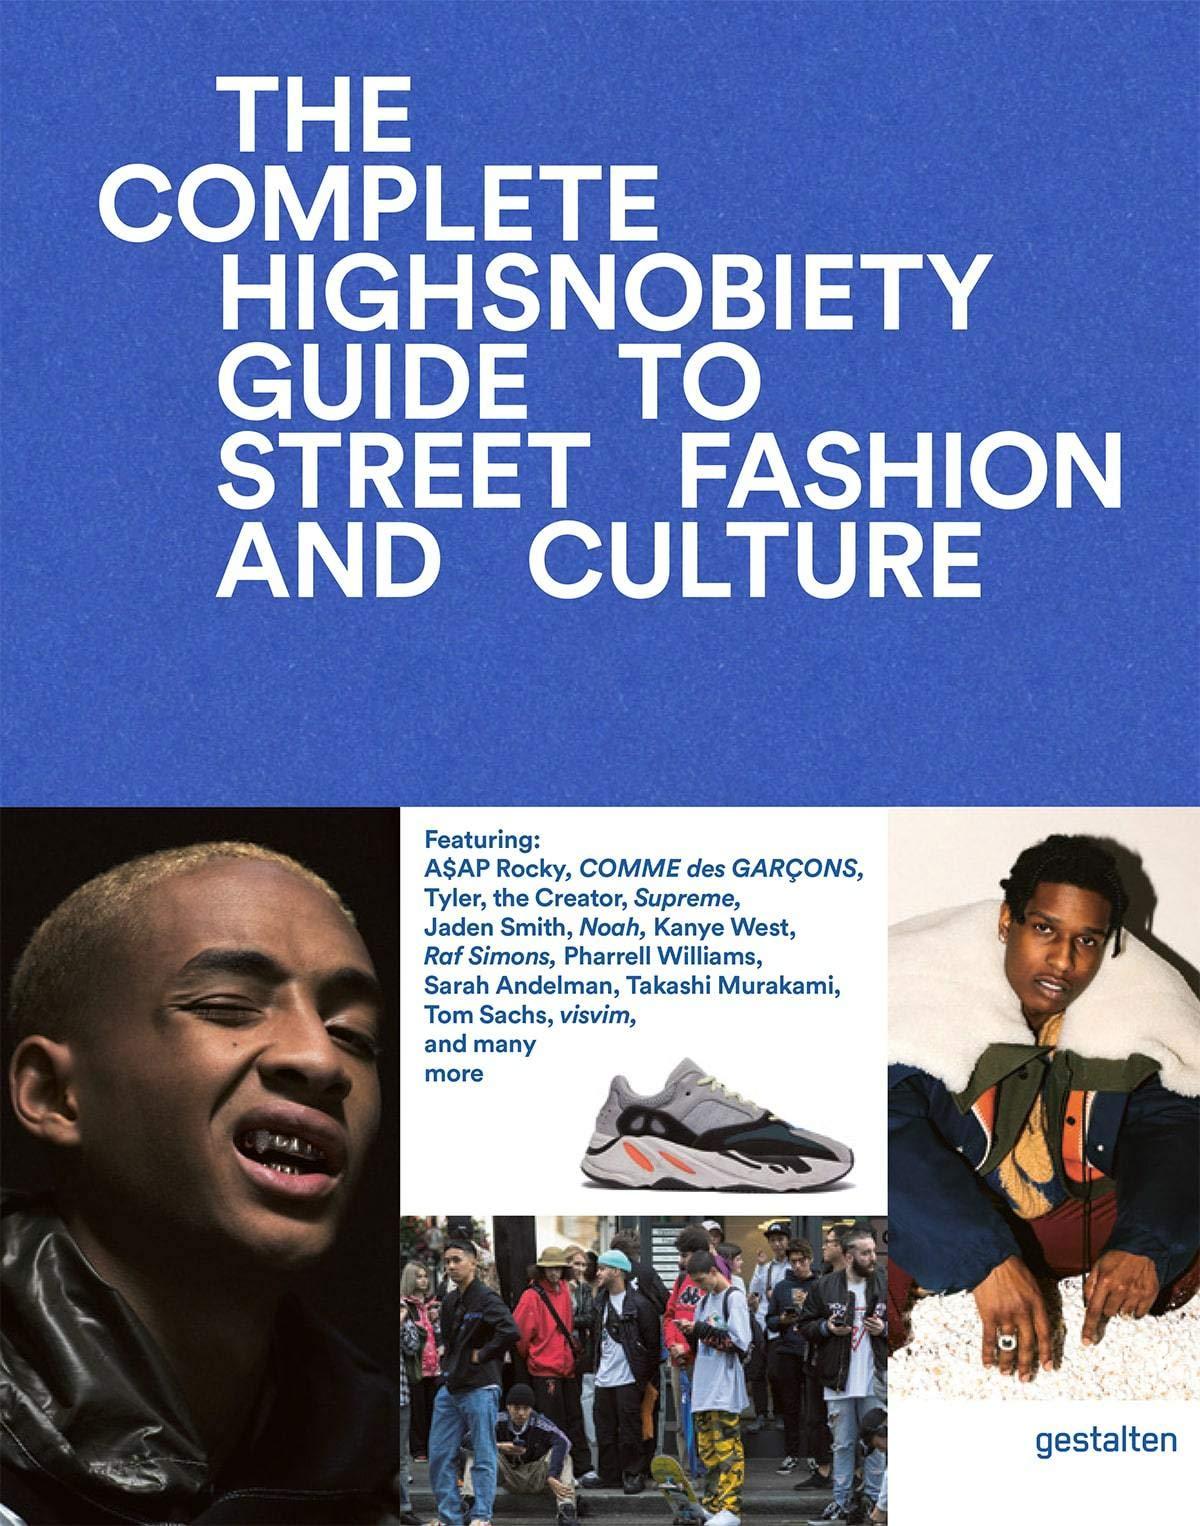 Hardcover Book on Streetwear